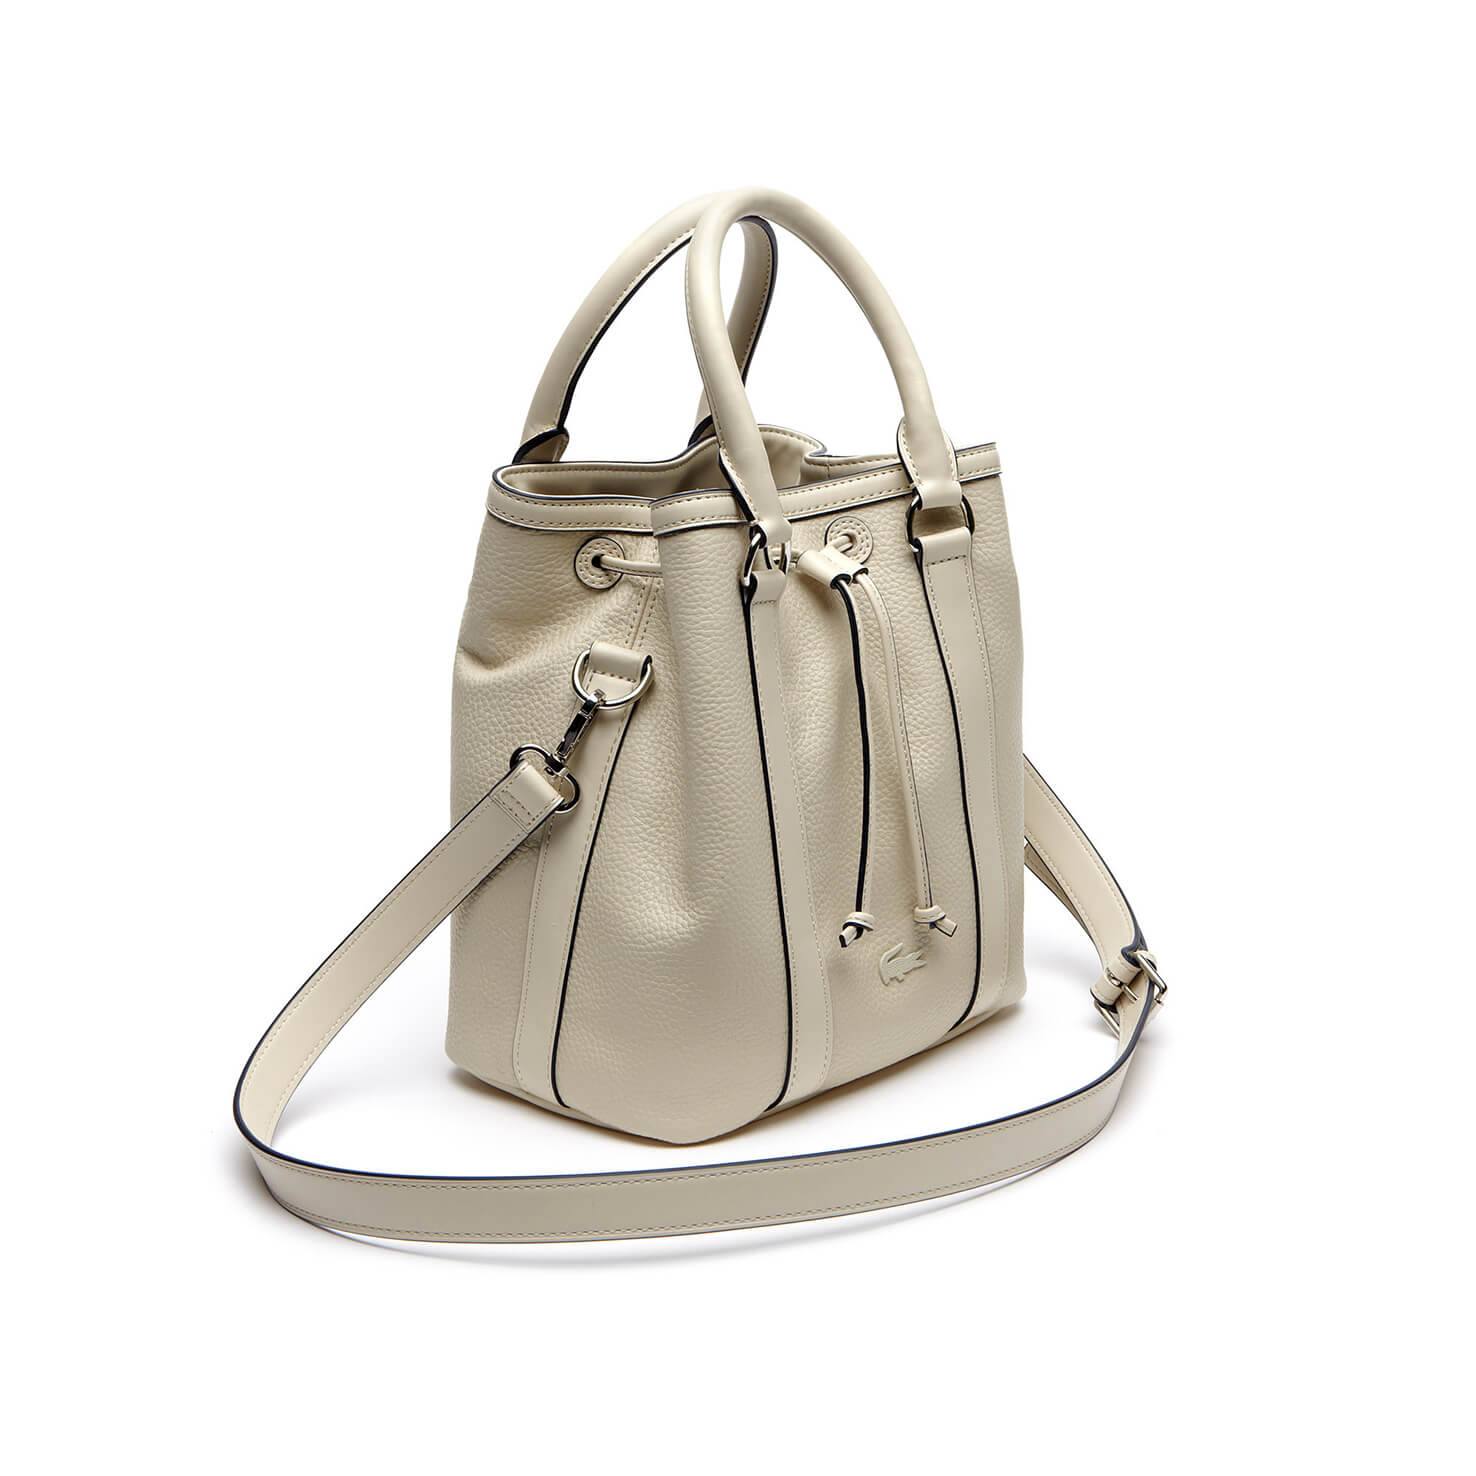 Lacoste Leather Cream Bag